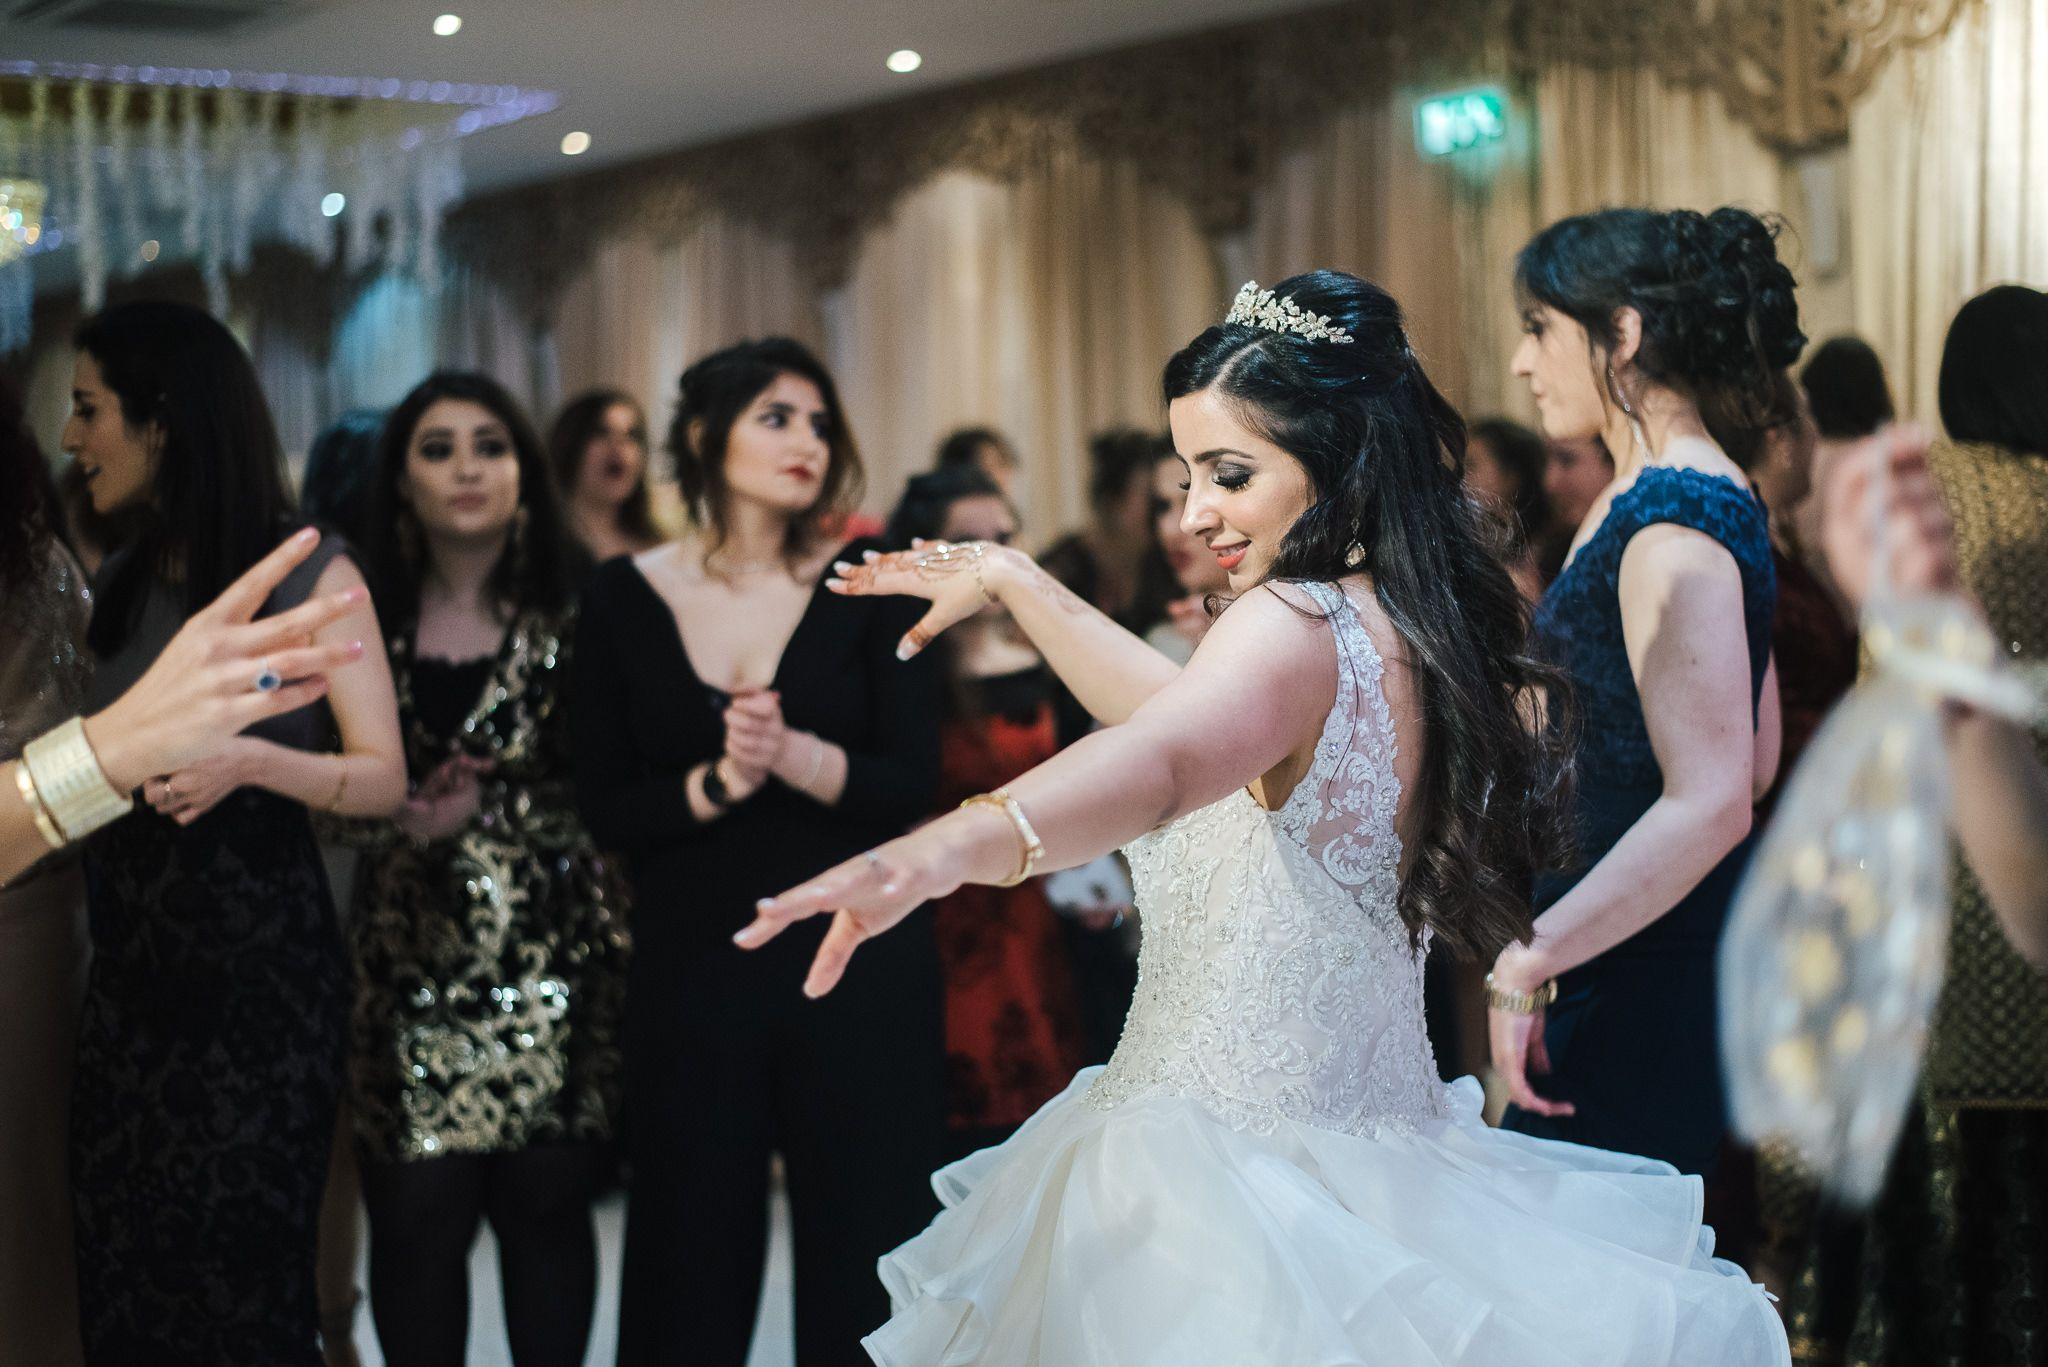 creative-west-yorkshire-wedding-photographer-11.jpg